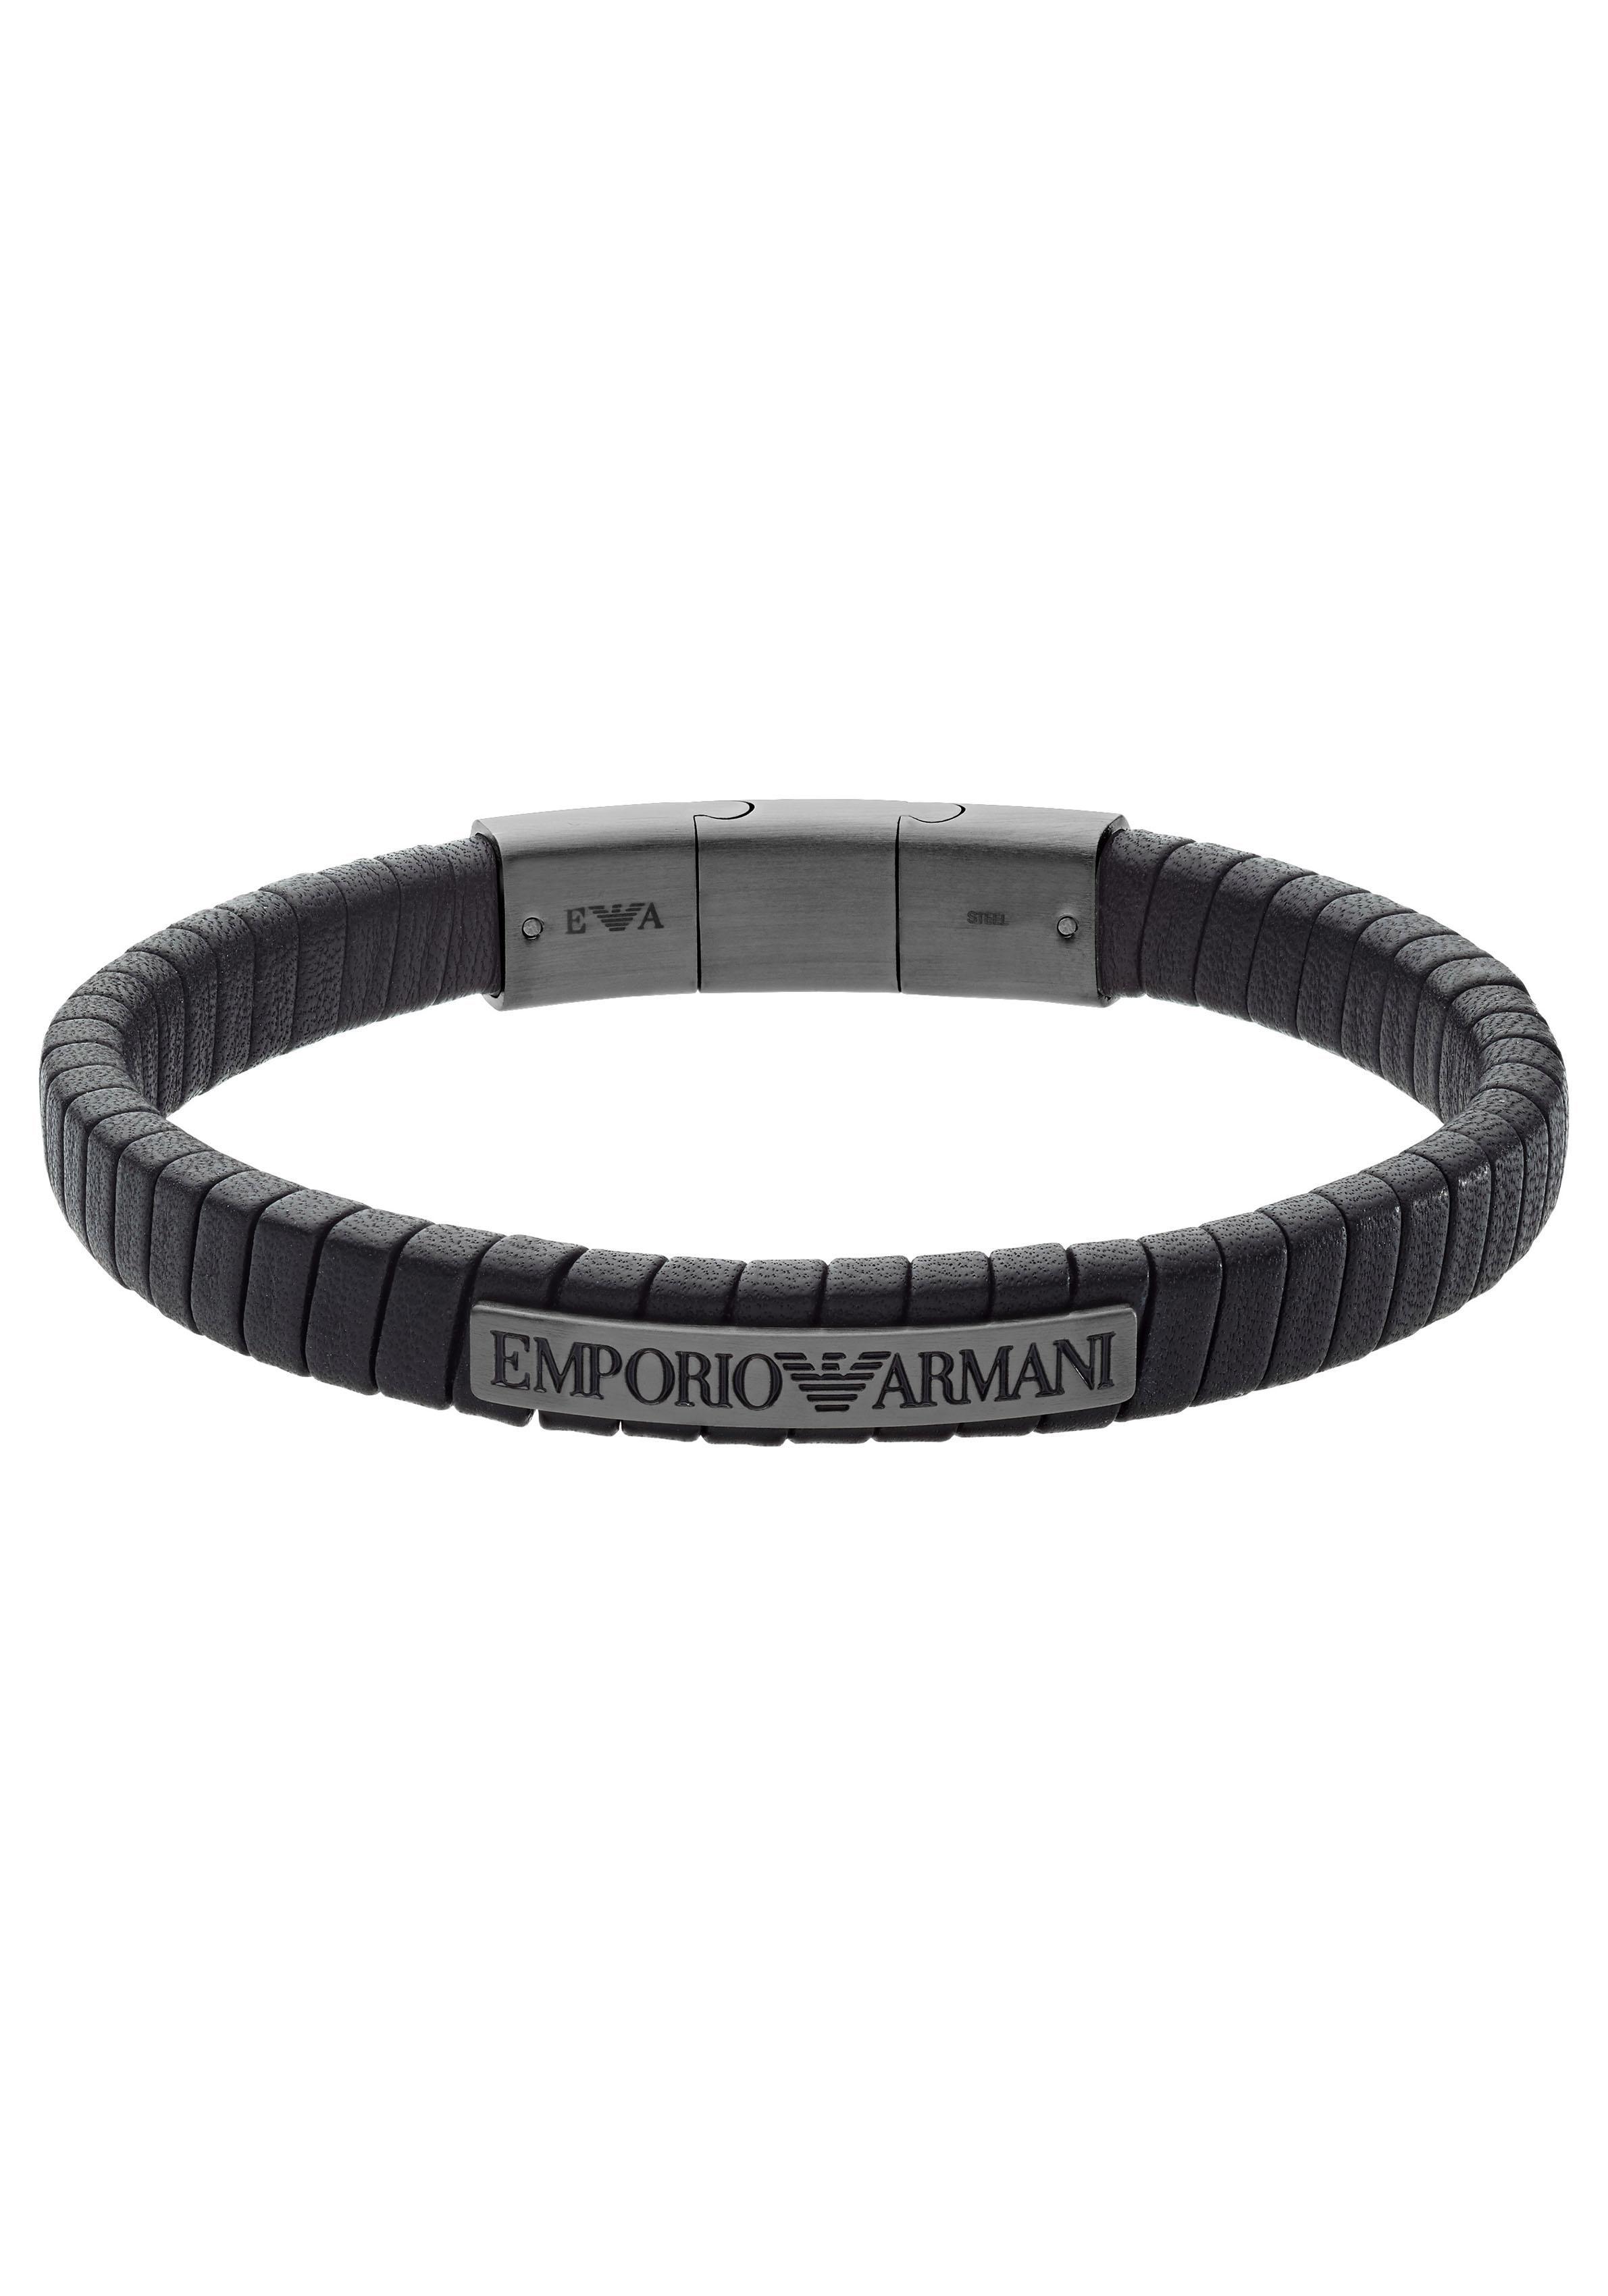 Emporio Armani Armband EGS2638060   Schmuck   Emporio Armani